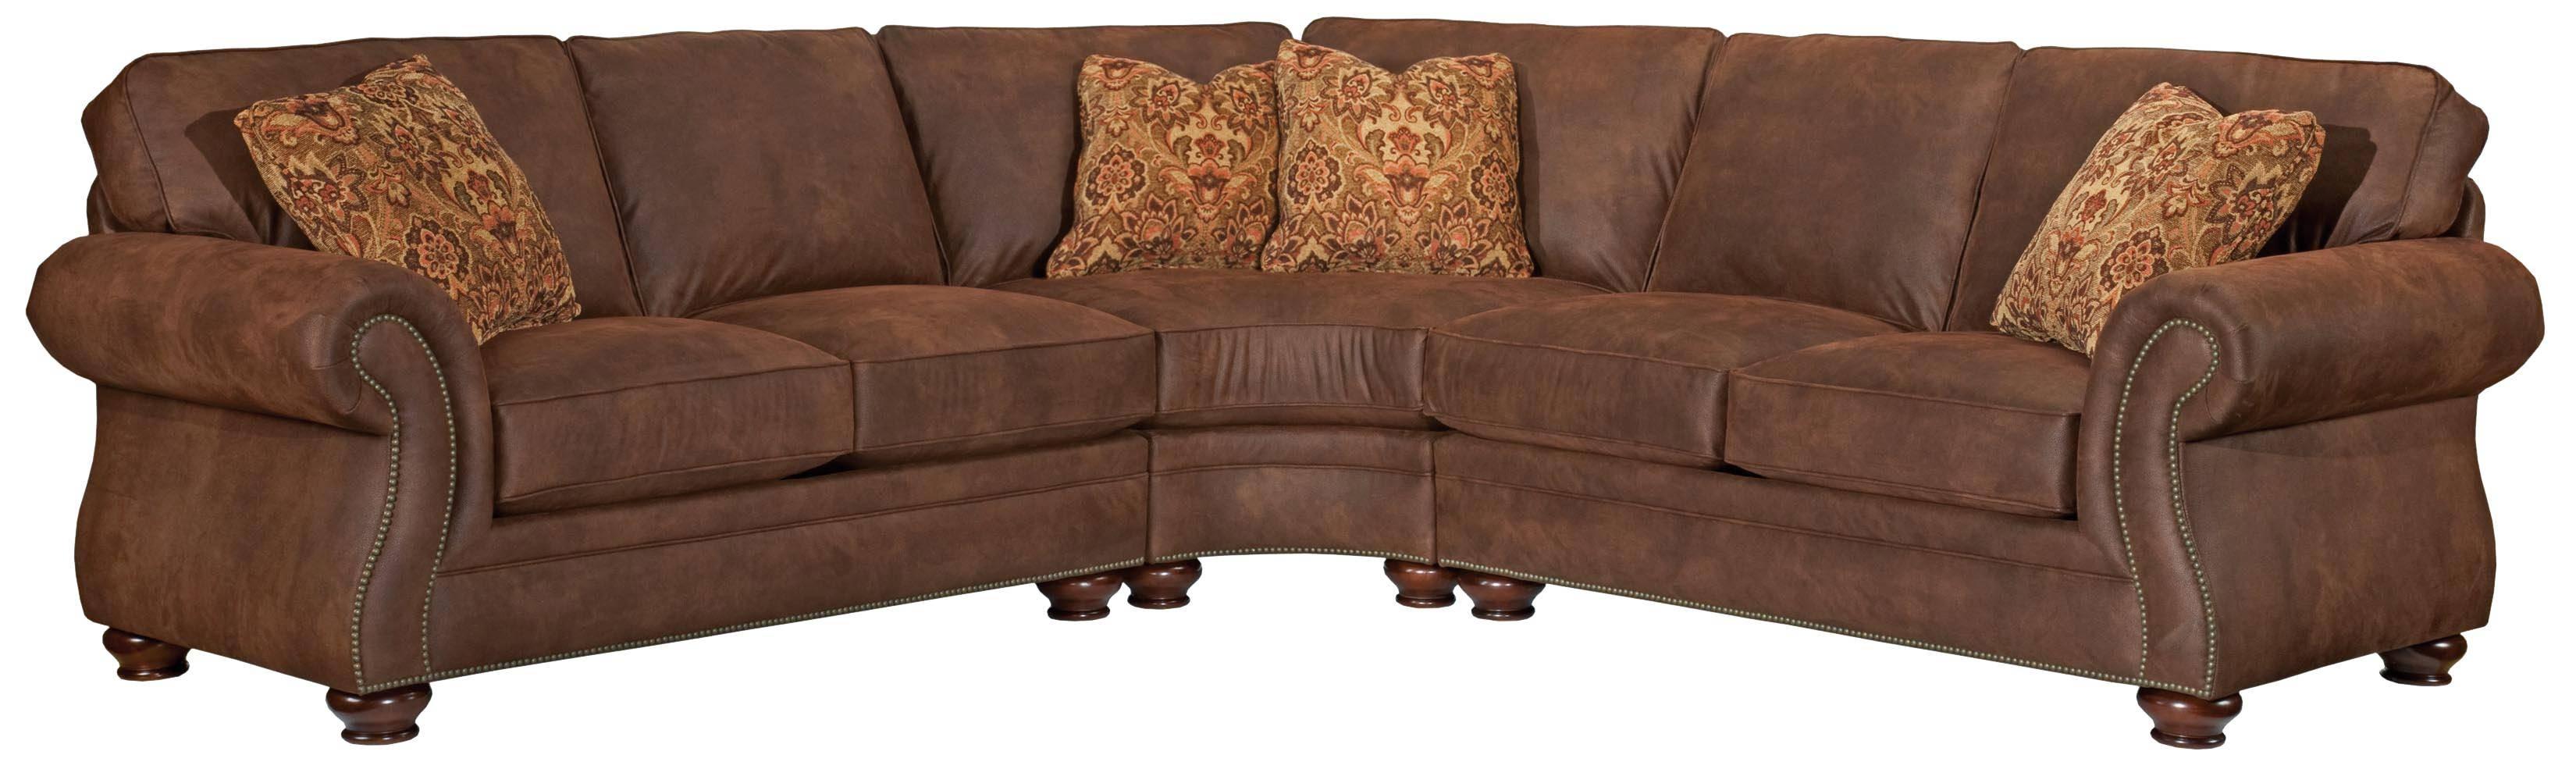 Broyhill Furniture Laramie 3 Piece Wedge Sectional Sofa - Ahfa inside Broyhill Harrison Sofas (Image 7 of 15)